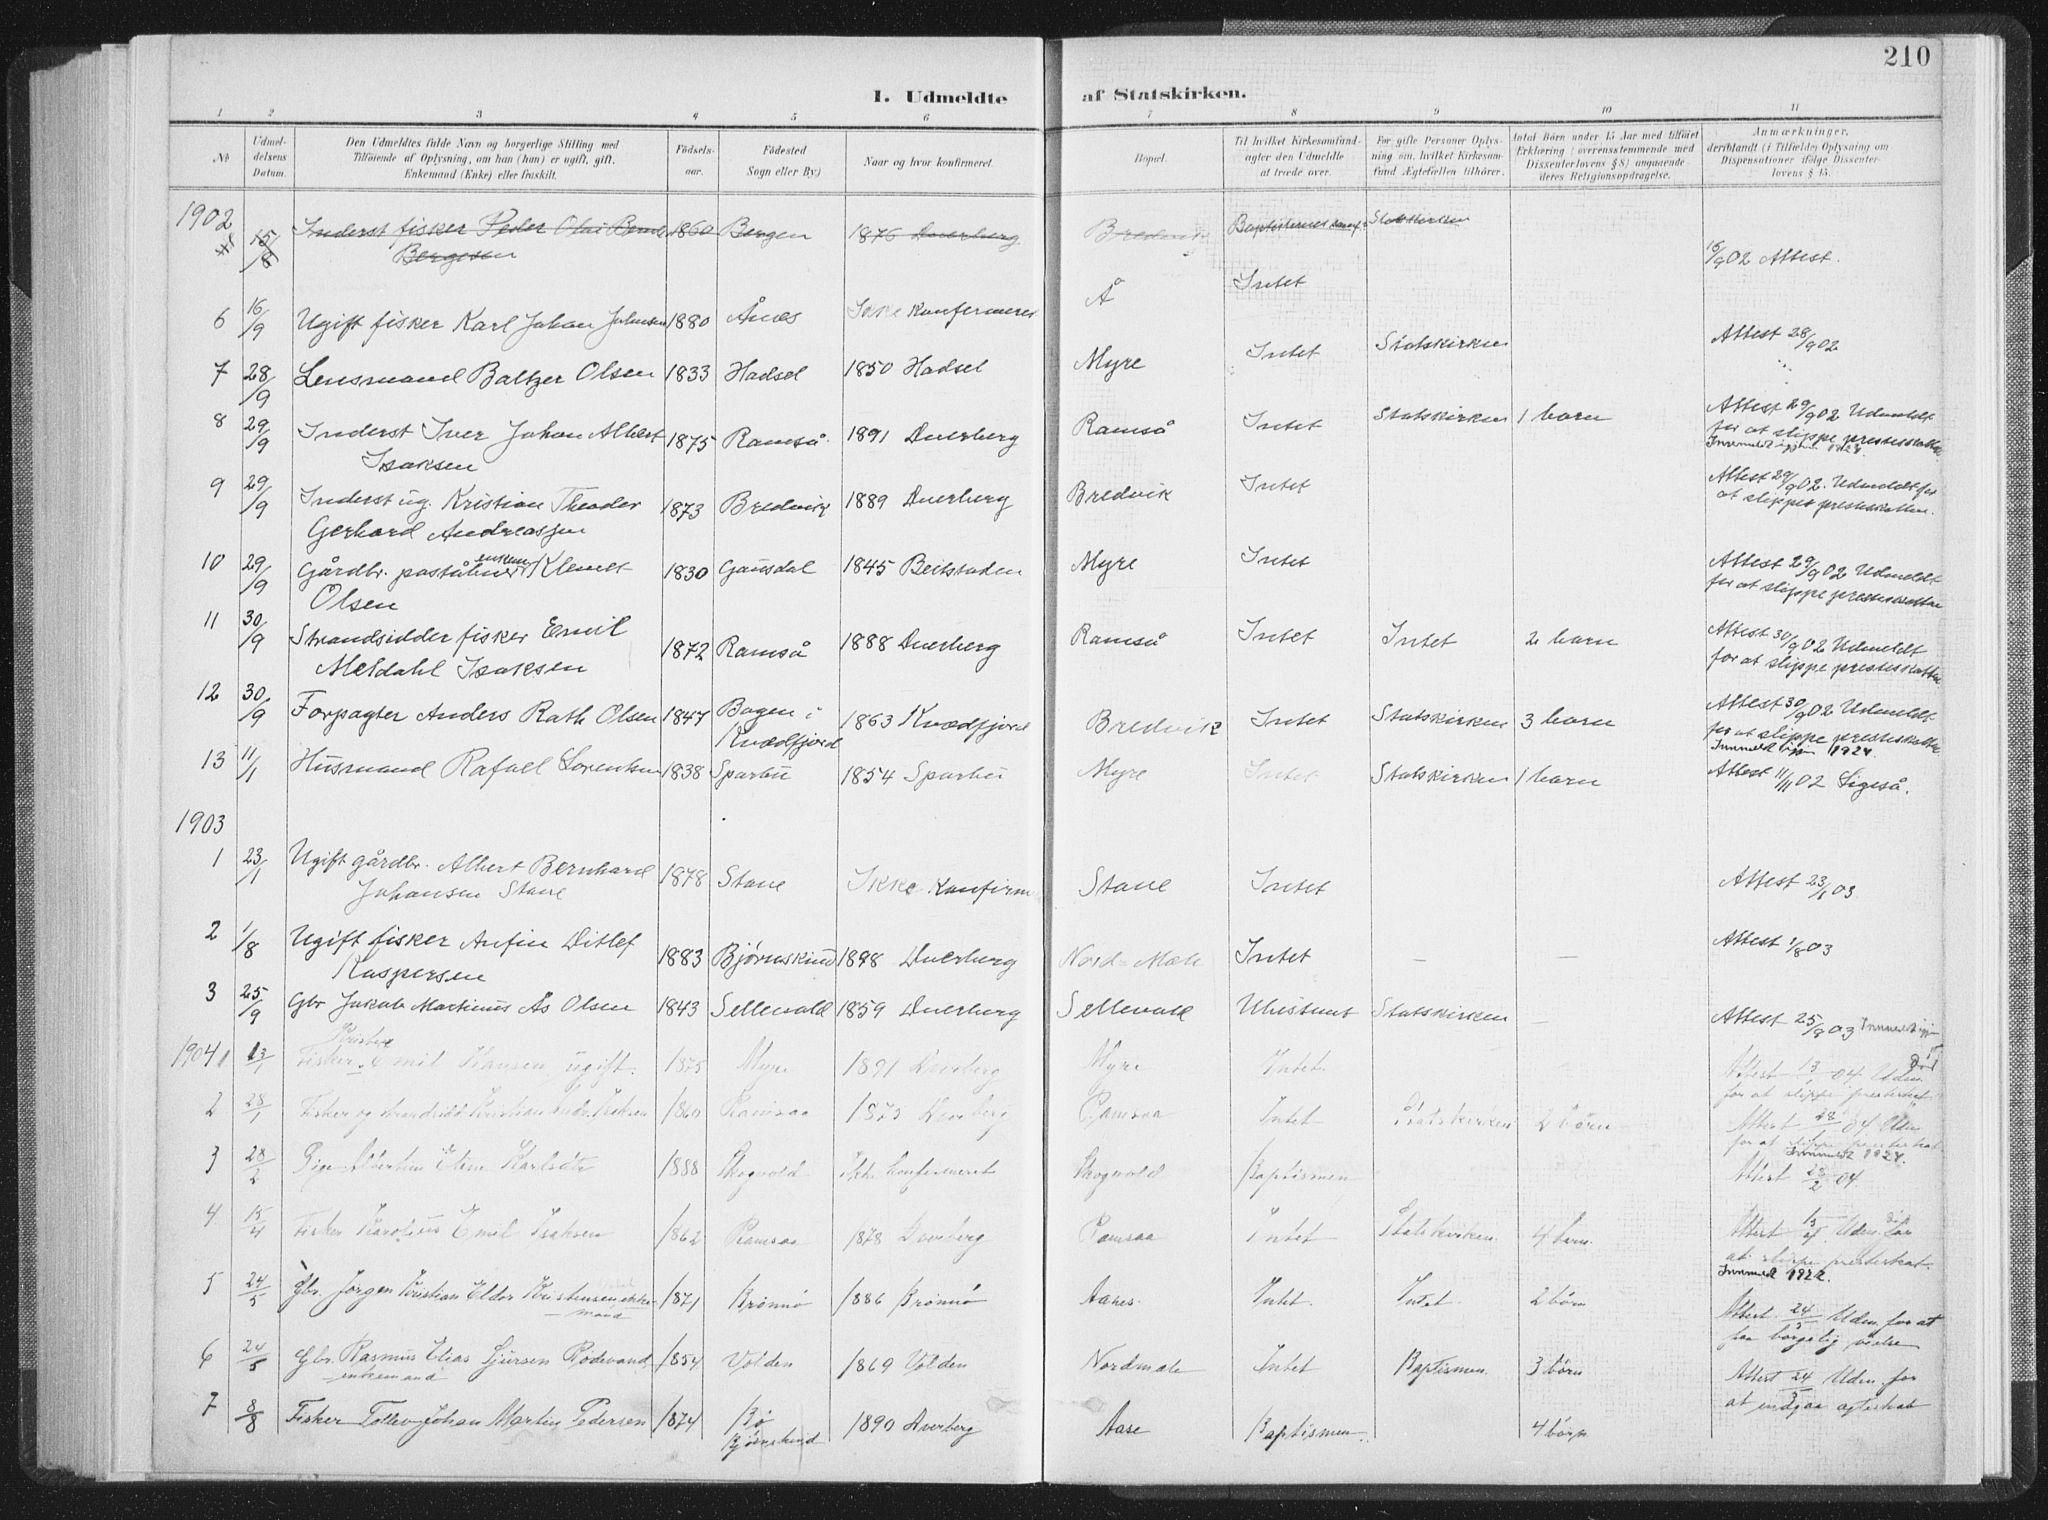 SAT, Ministerialprotokoller, klokkerbøker og fødselsregistre - Nordland, 897/L1400: Ministerialbok nr. 897A07, 1897-1908, s. 210